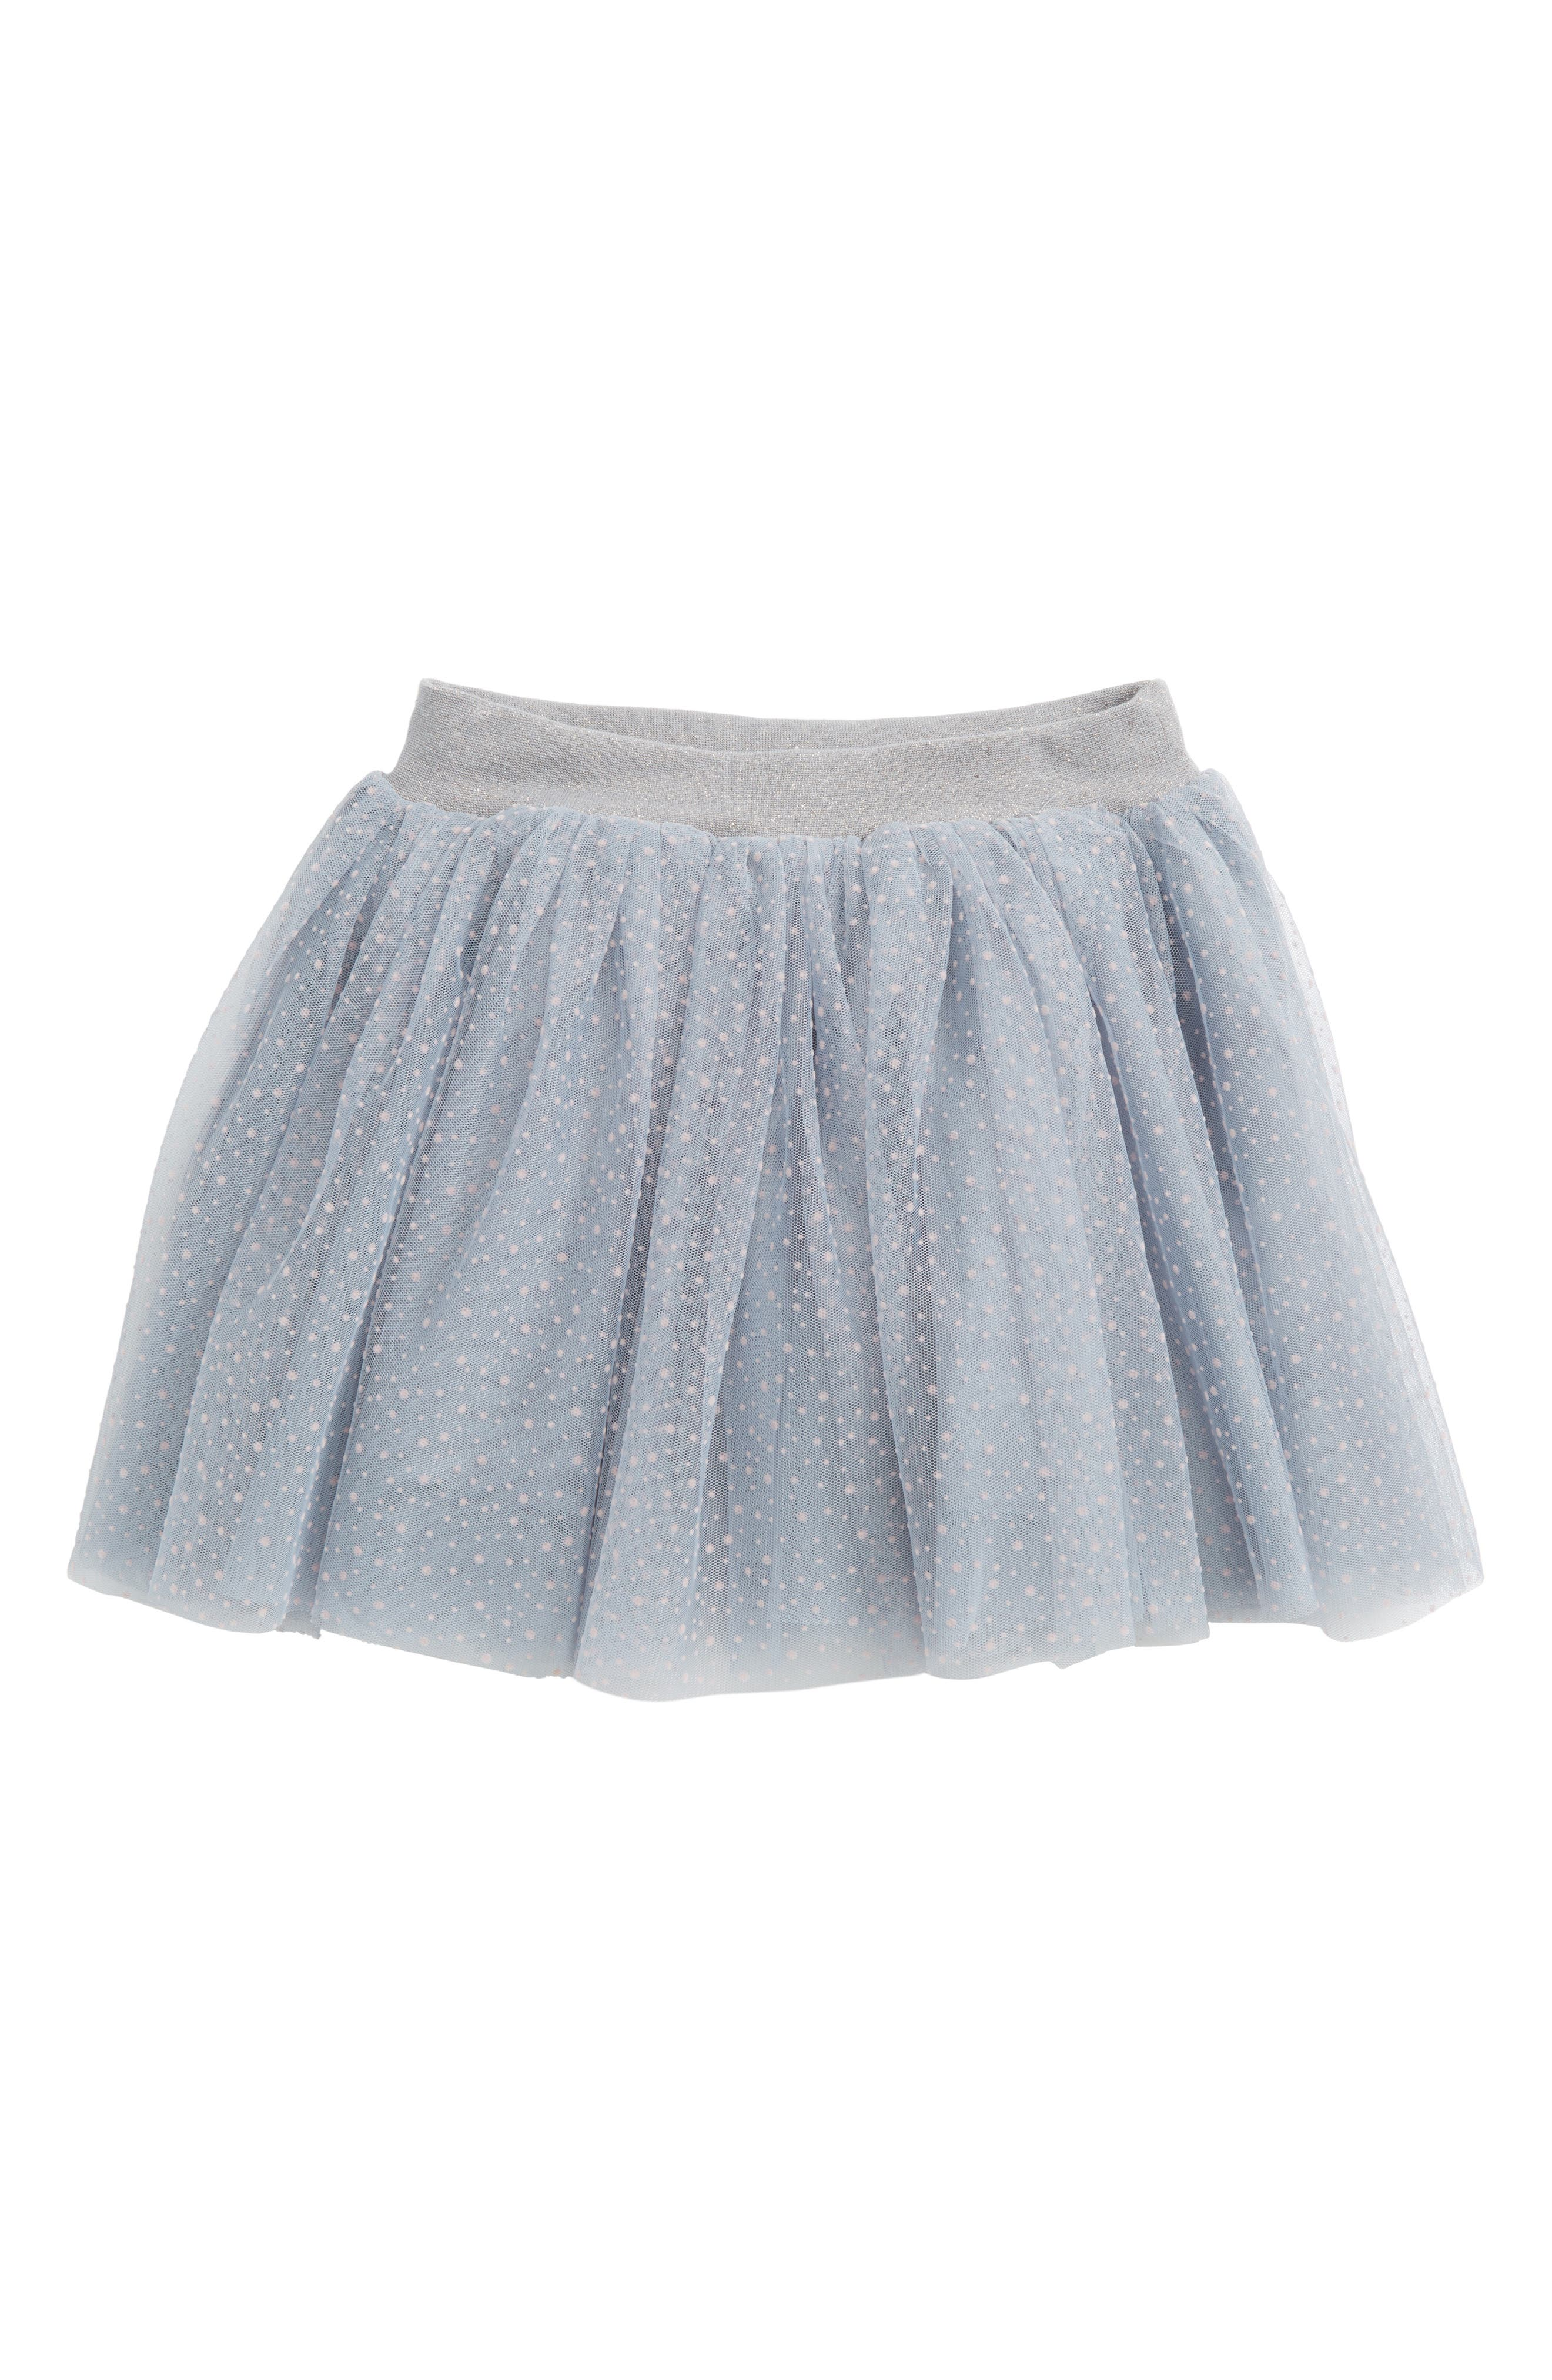 Mina Skirt,                         Main,                         color, 020